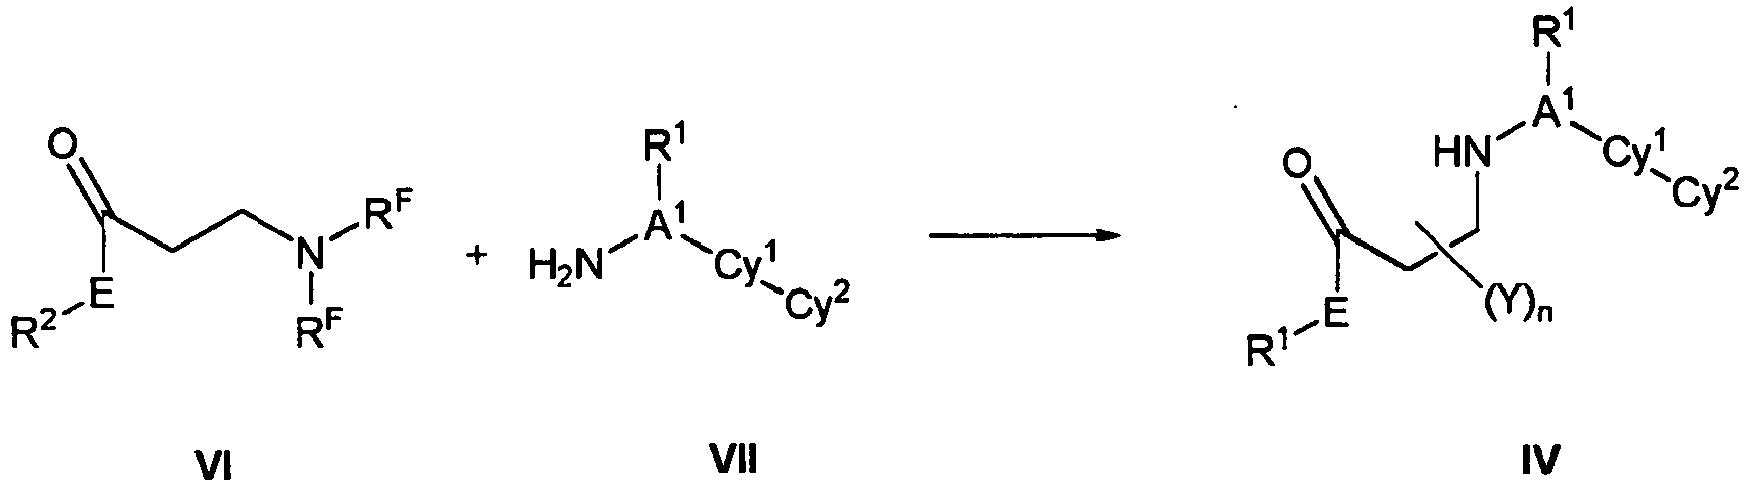 11beta hydroxysteroid dehydrogenase